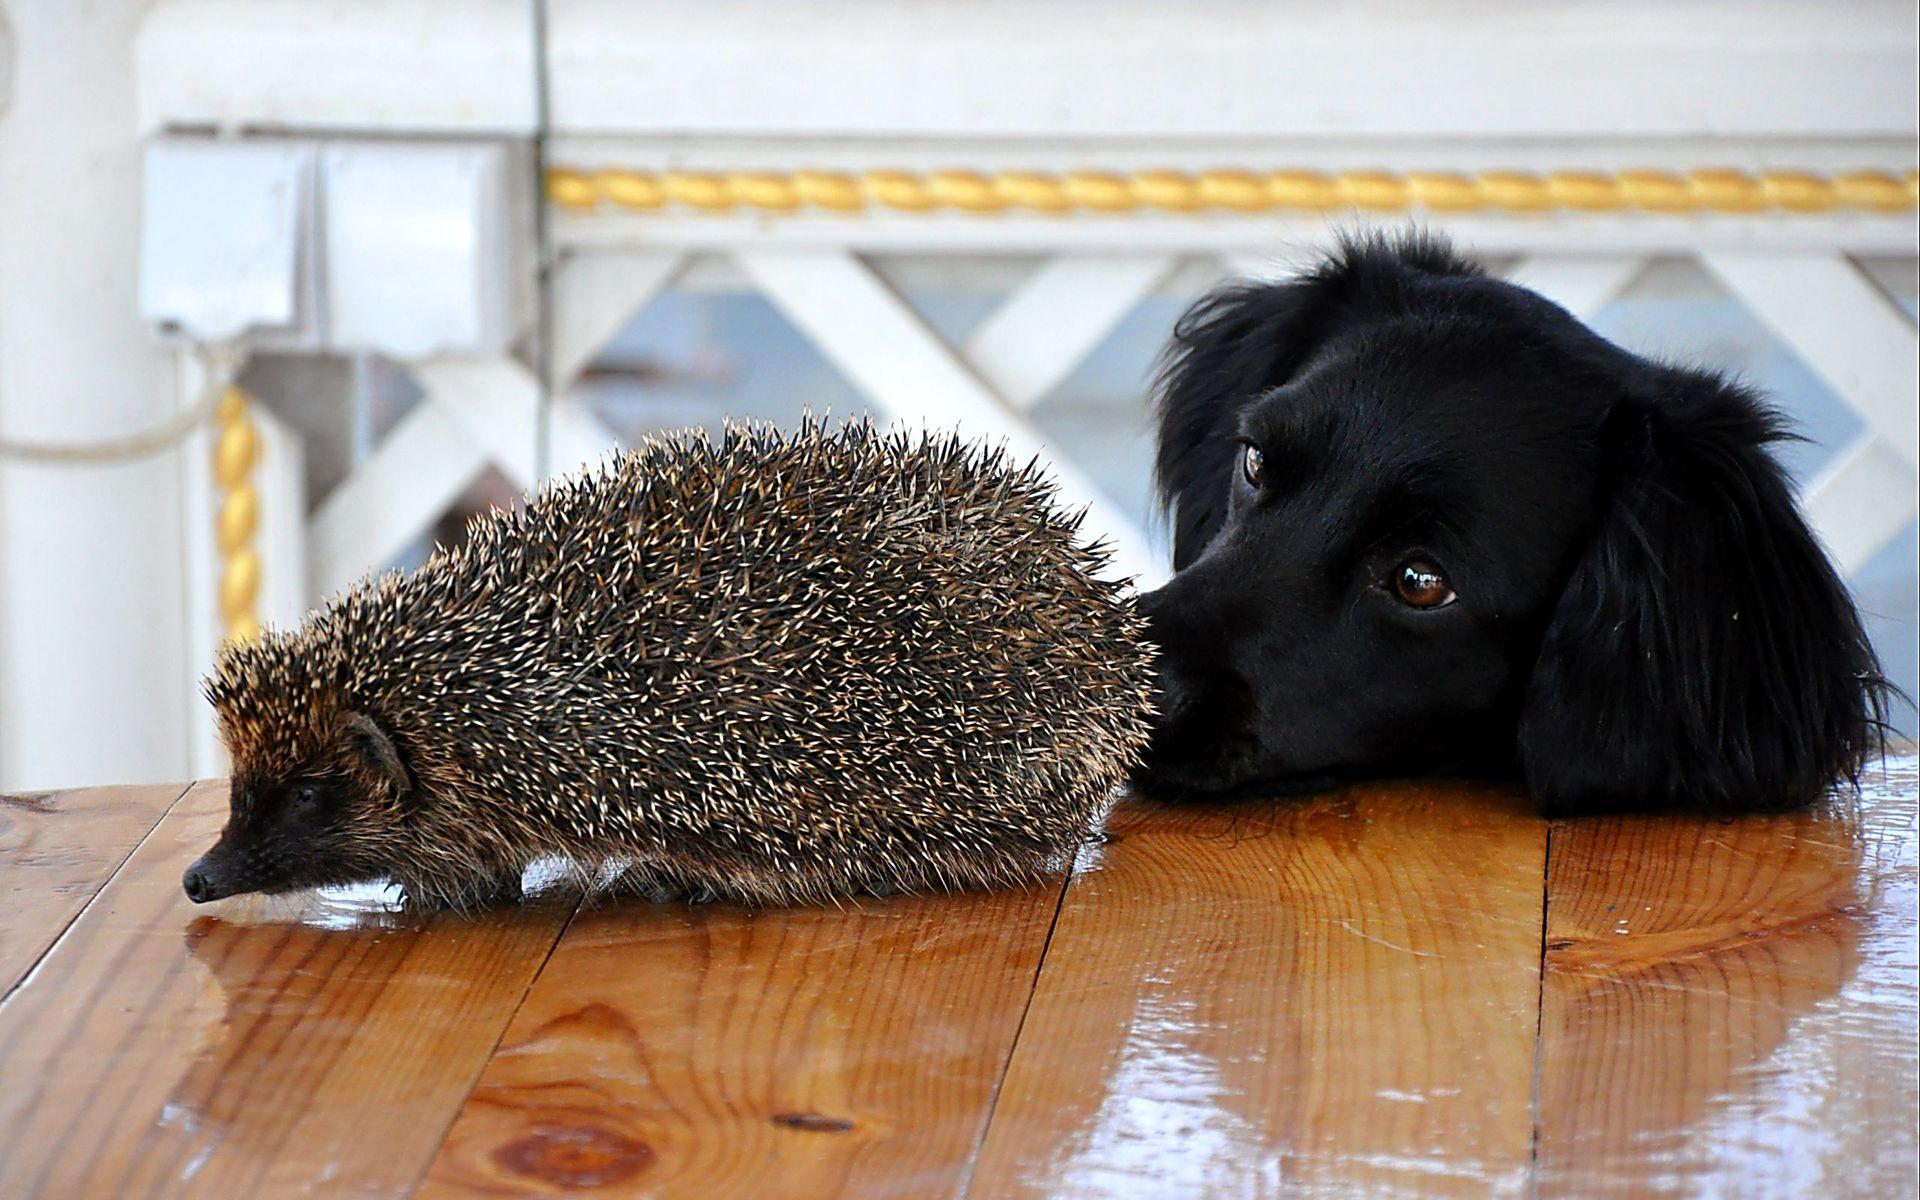 Обои на рабочий стол: собаки (15 фото)